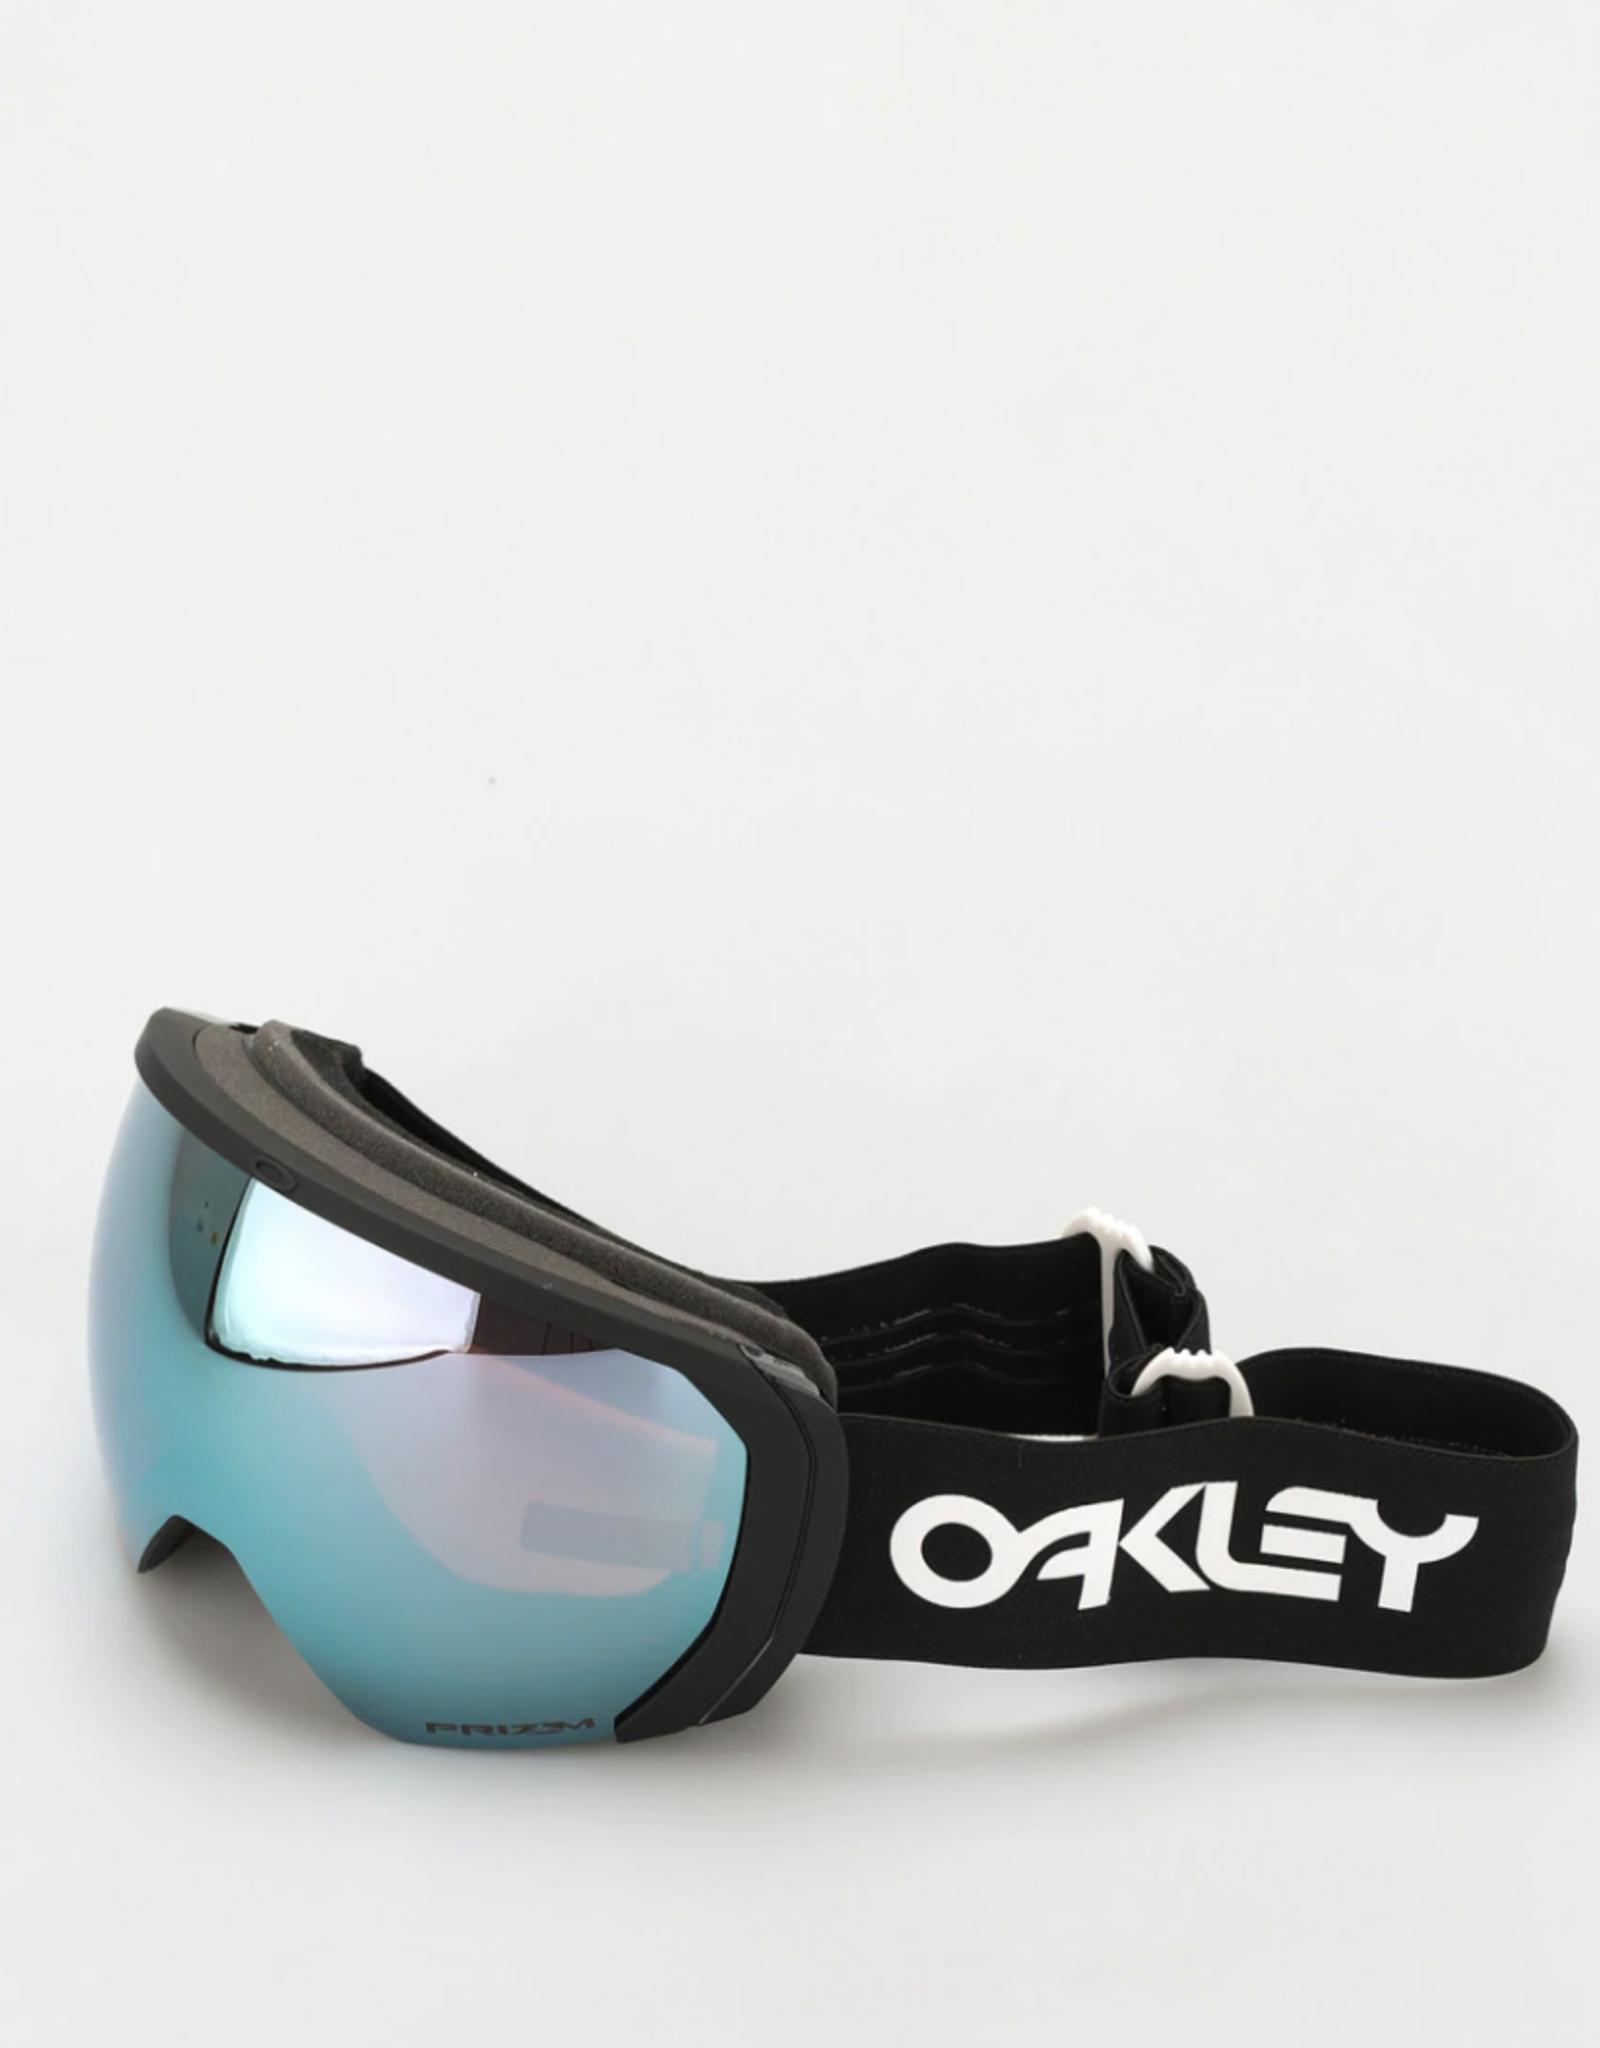 Oakley FLIGHT PATH L FACTORY PILOT BLACK W/ PRIZM SNOW SAPPHIRE